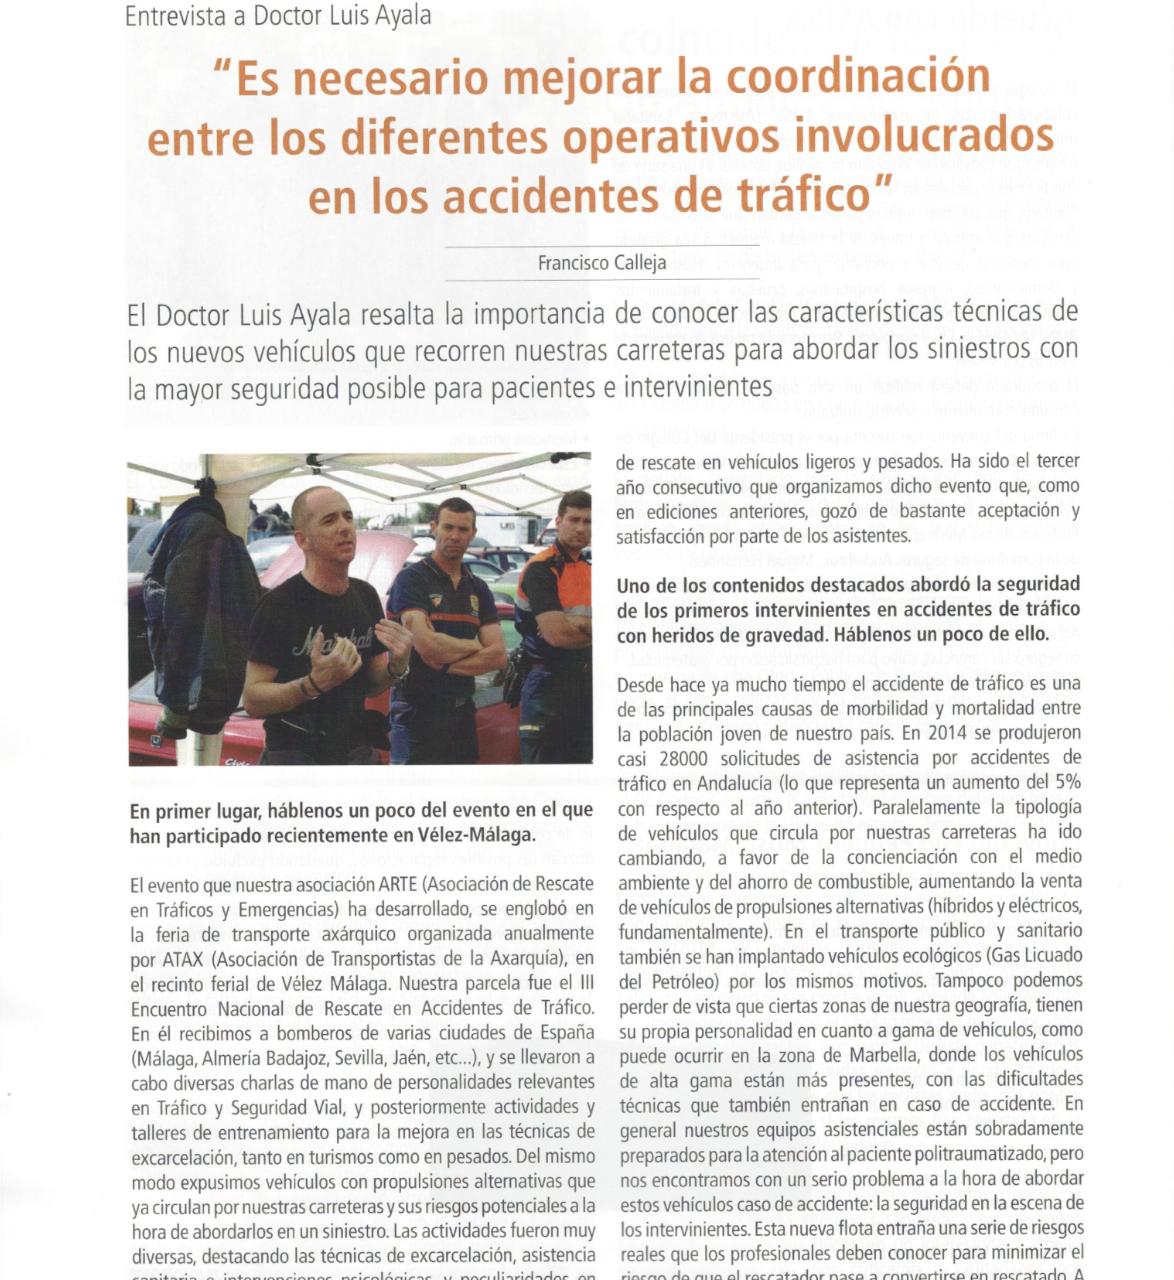 http://artemergencia.es/wp-content/uploads/2018/05/entrevista-1174x1280.png